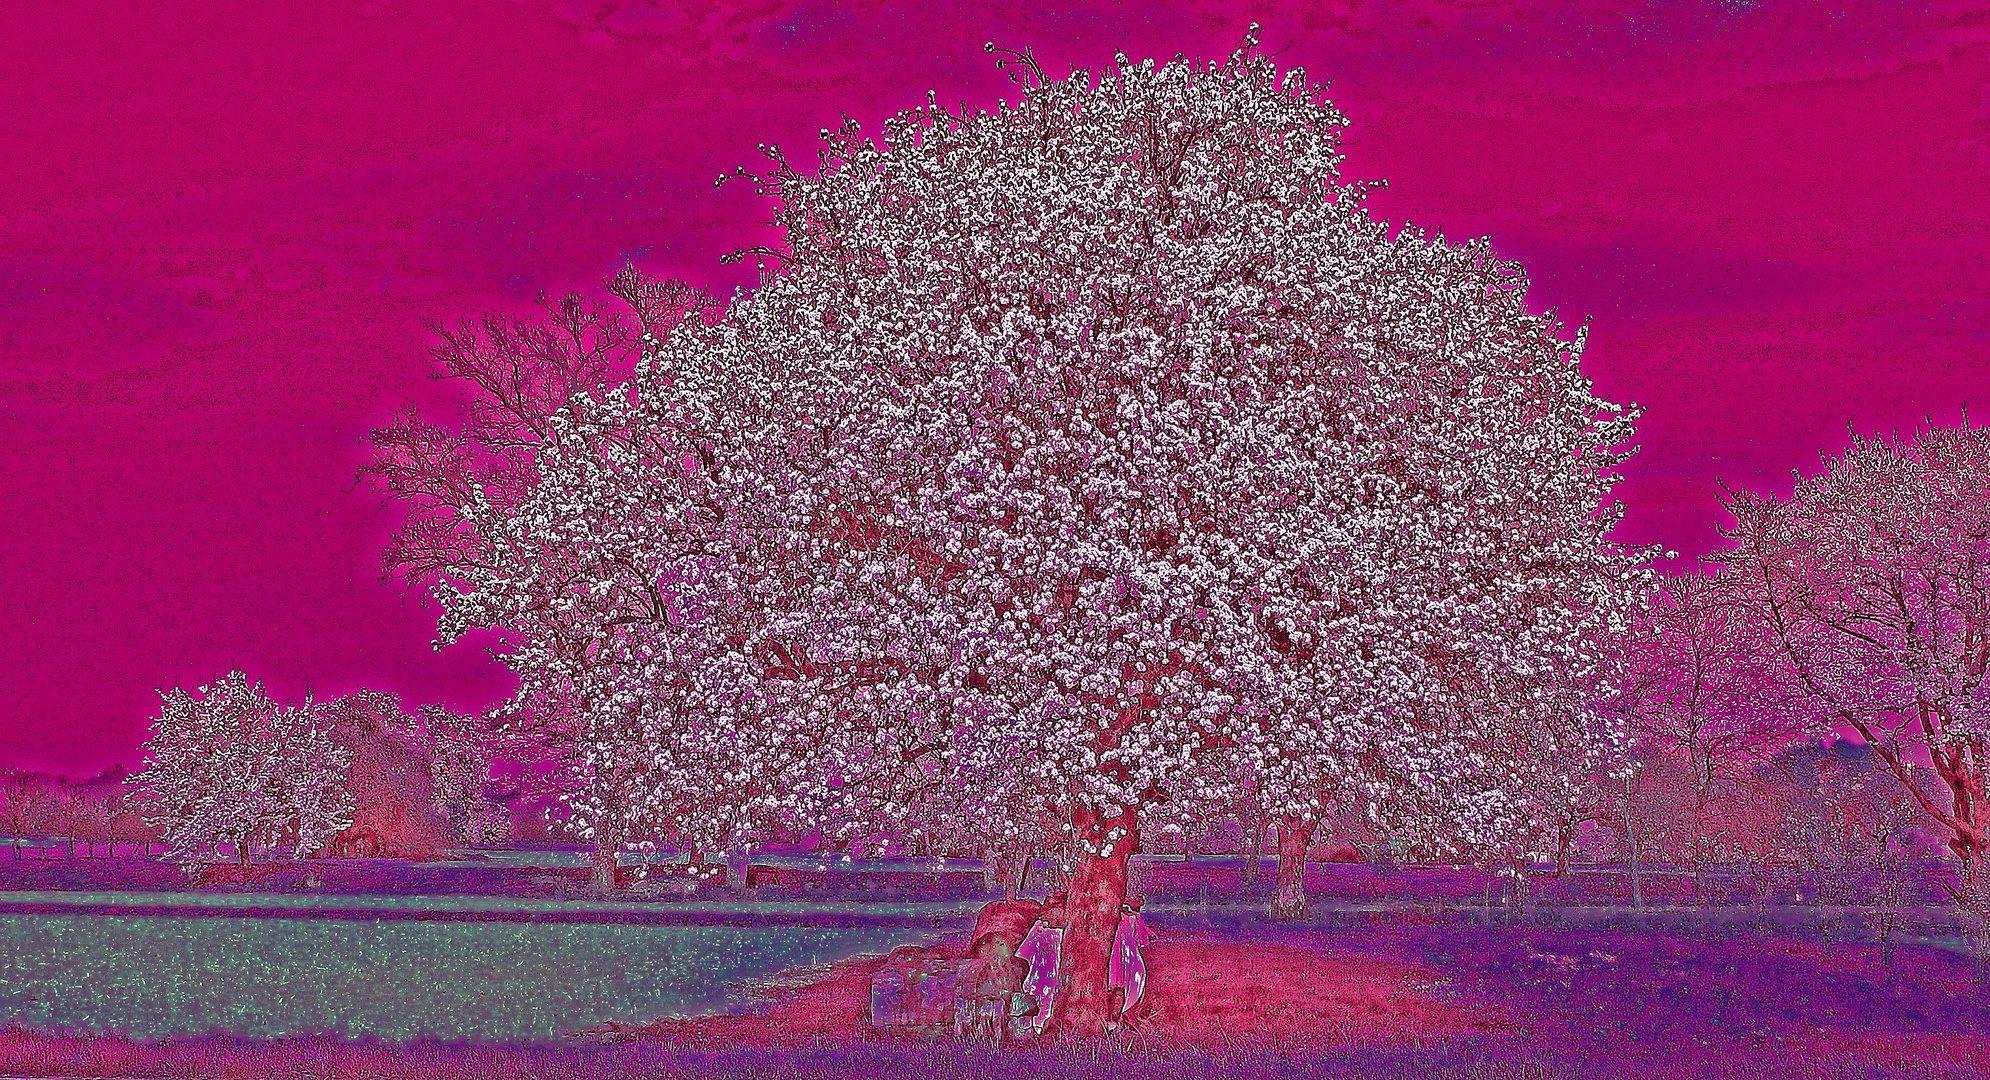 Kirschblüte (verändert)